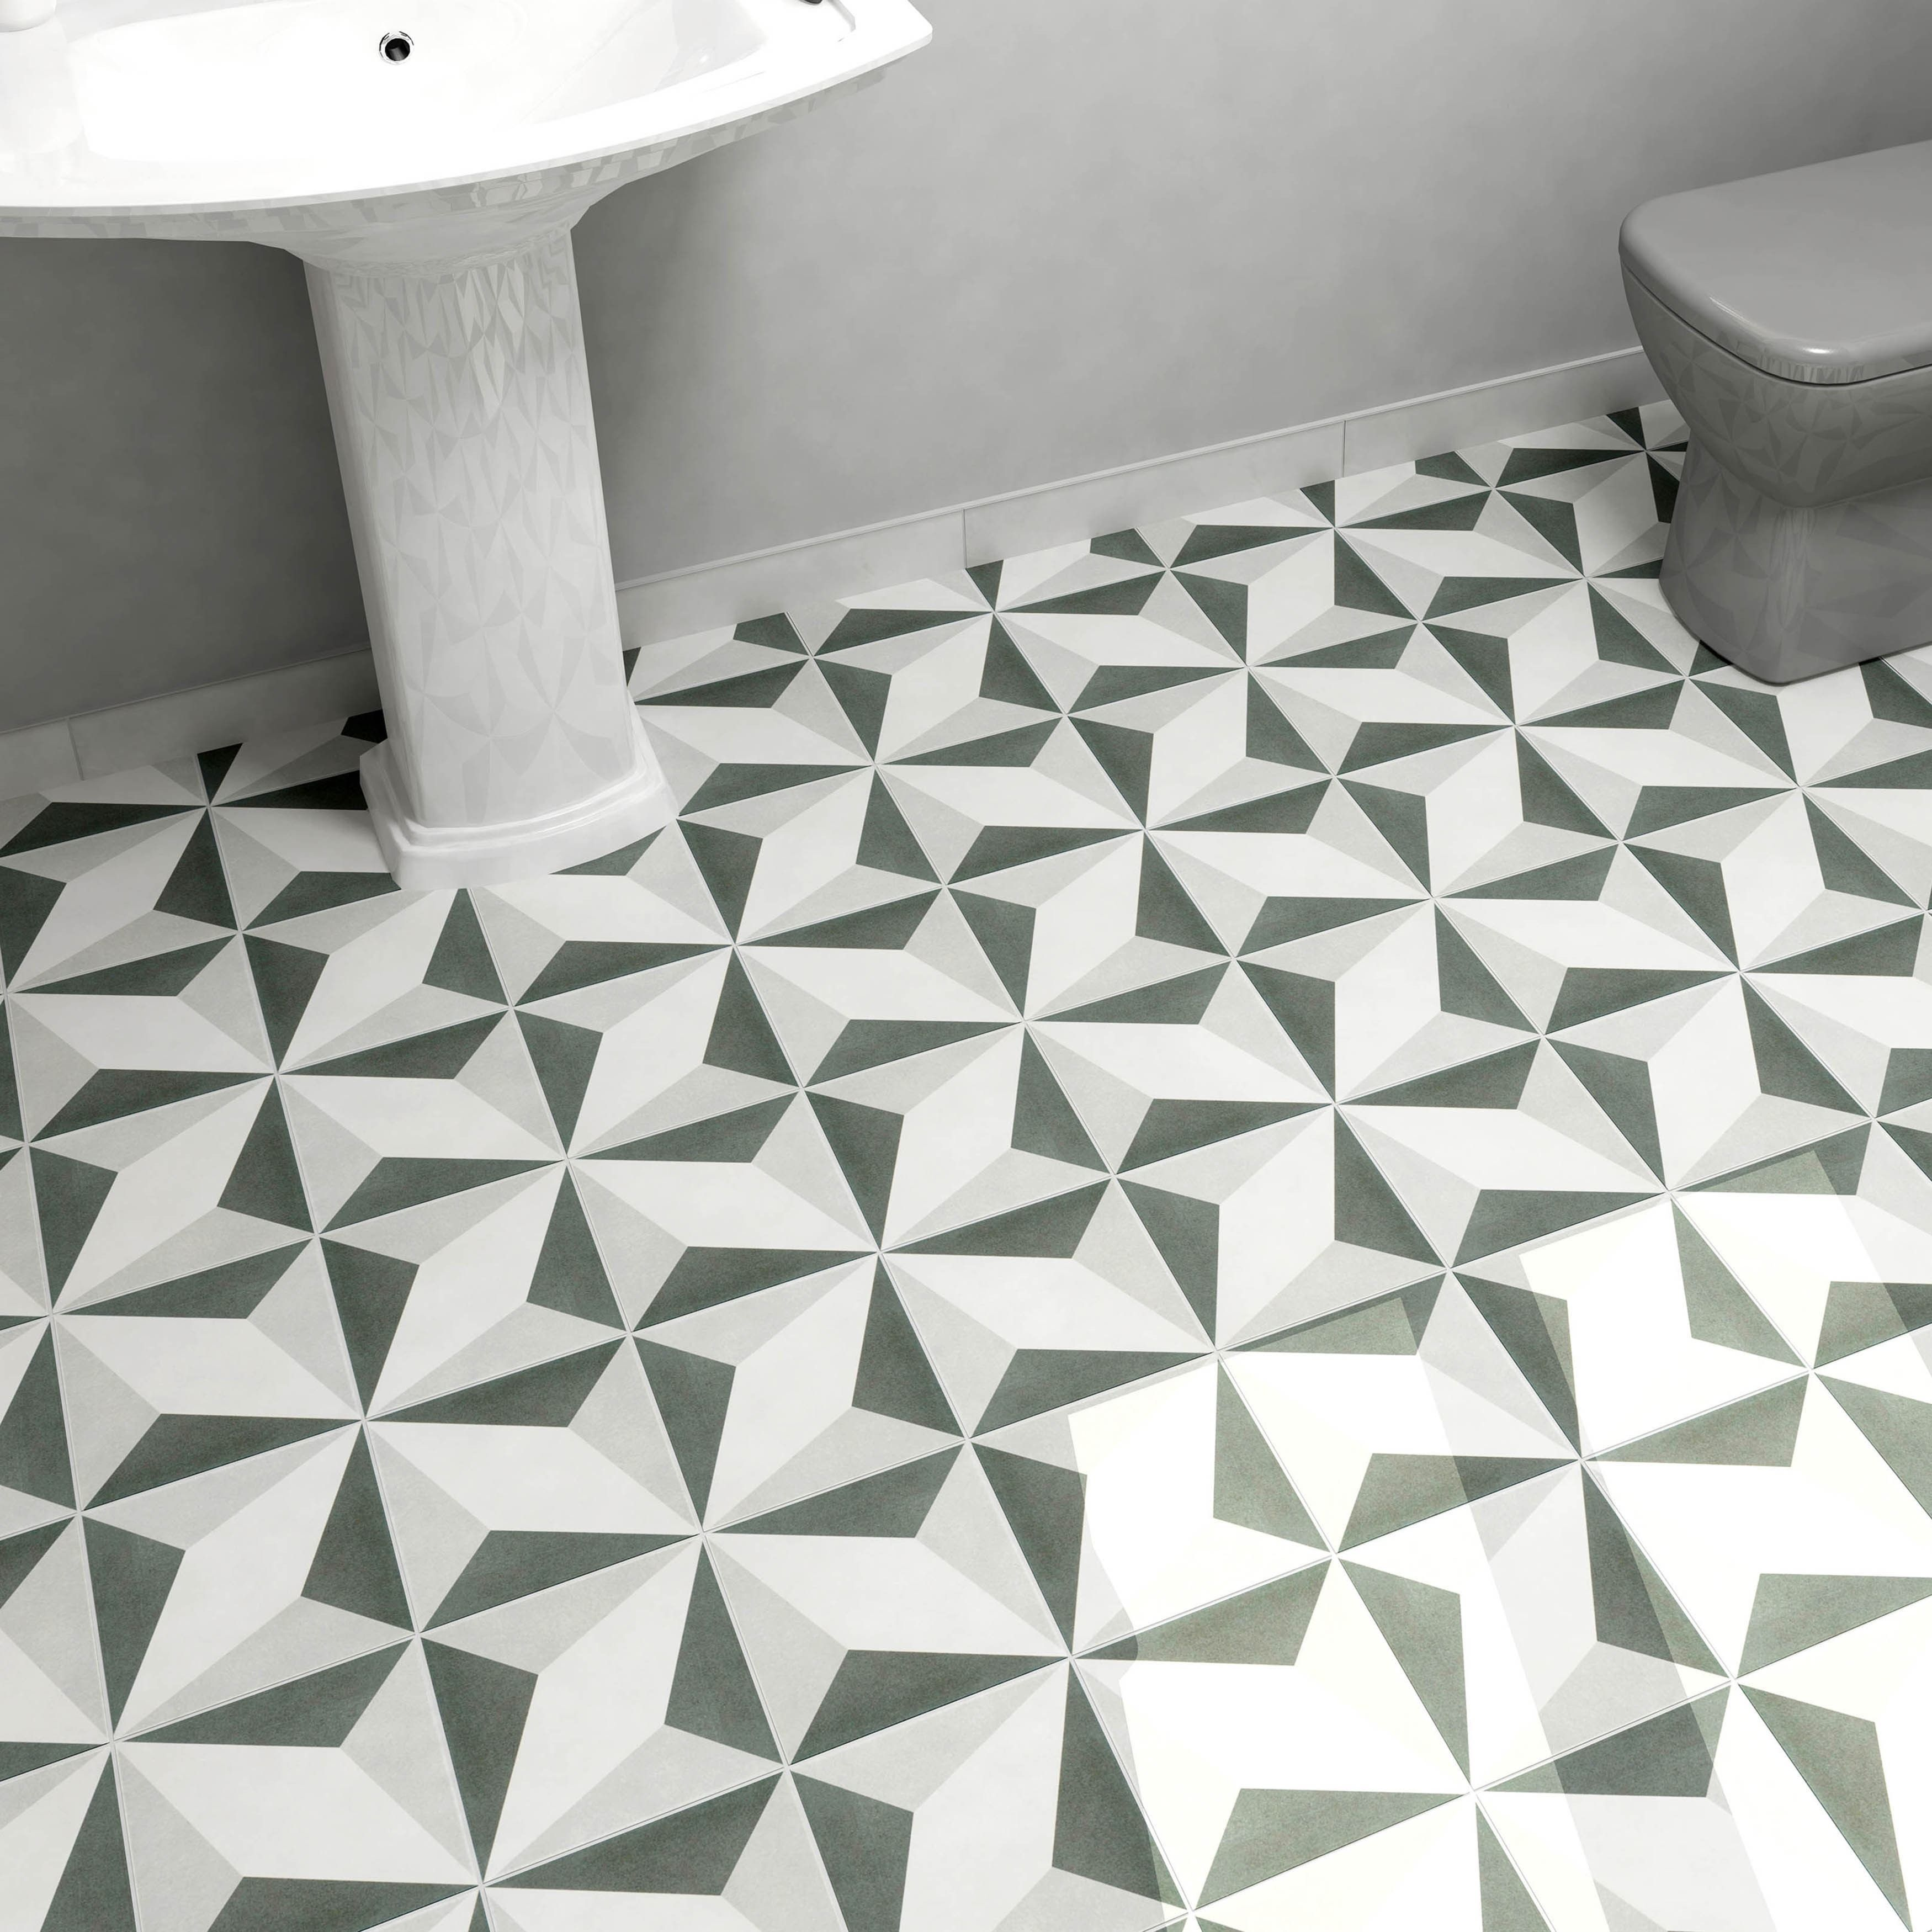 Somertile 775x775 Inch Thirties Diamond Ceramic Floor And Wall